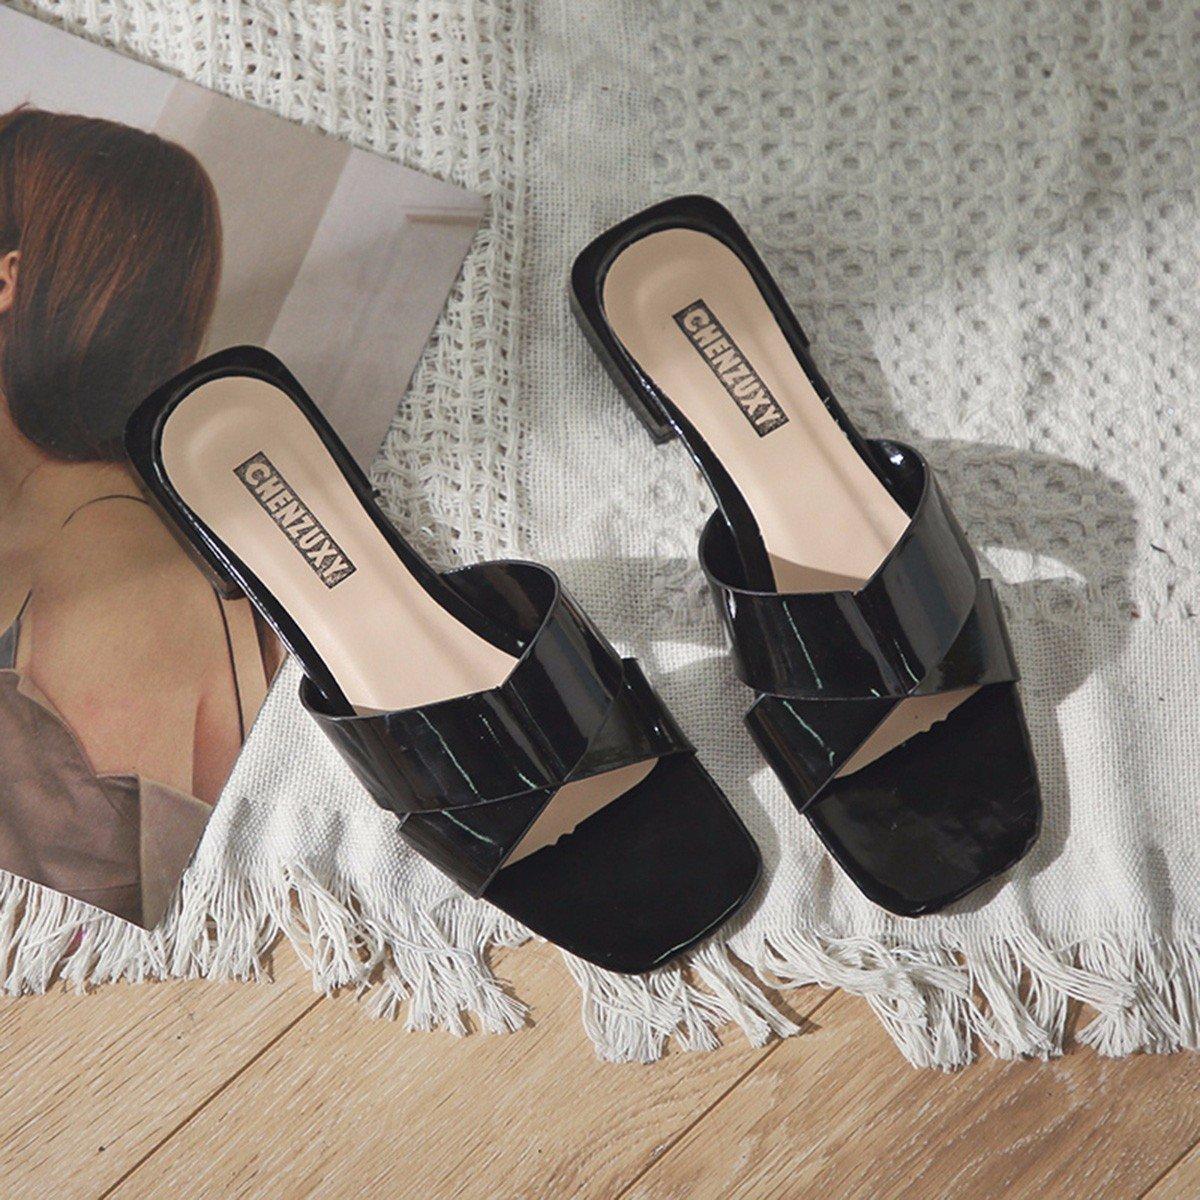 QPSSP Sandalen Und Slipper, Crossover, Damen Strand, Schuhe, Sportbekleidung, Sandalen, Damen Crossover, - Schuhe,36,Schwarz - cee9d3